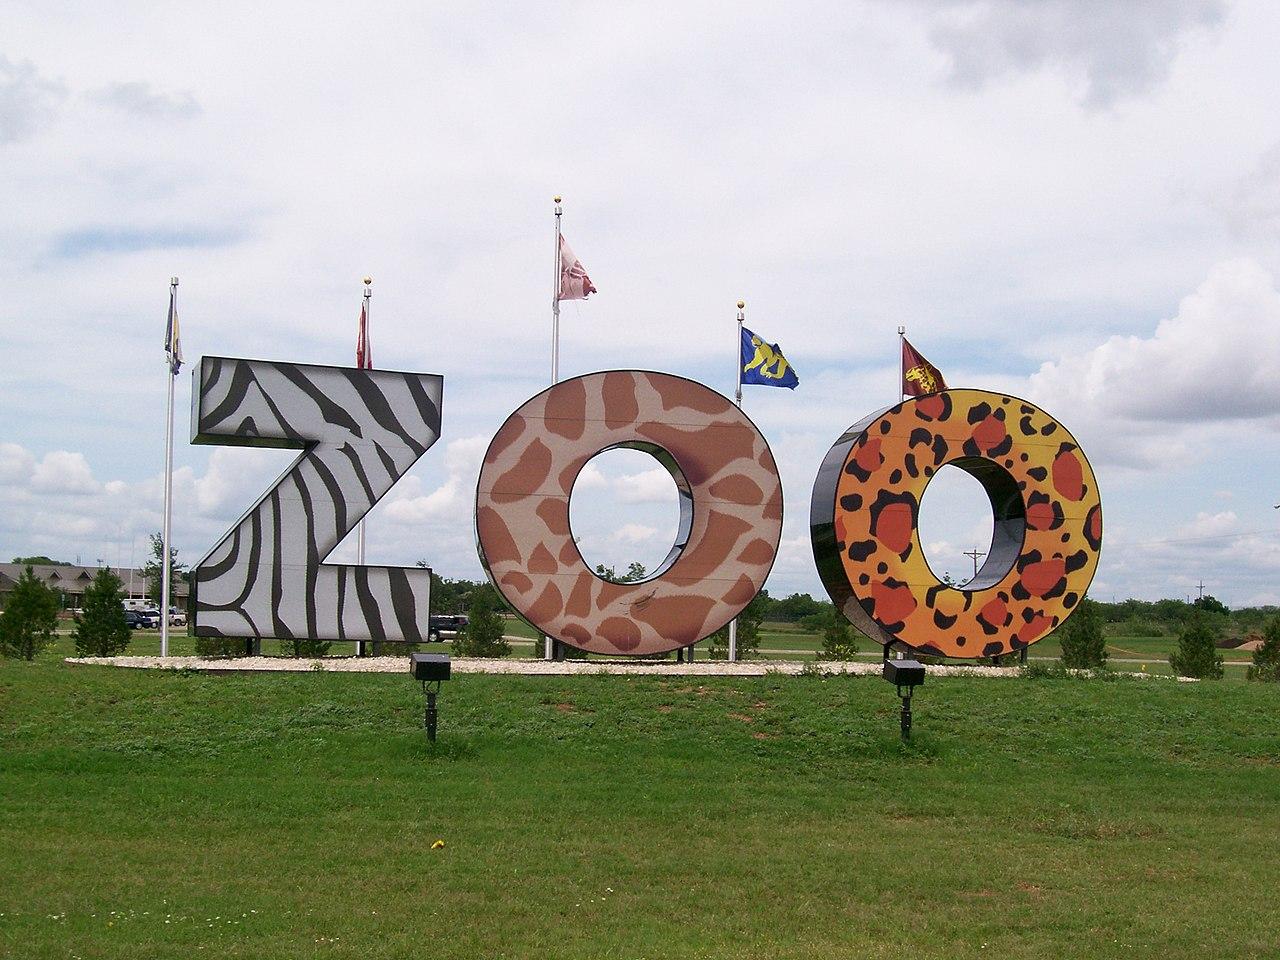 Zoo in odessa tx